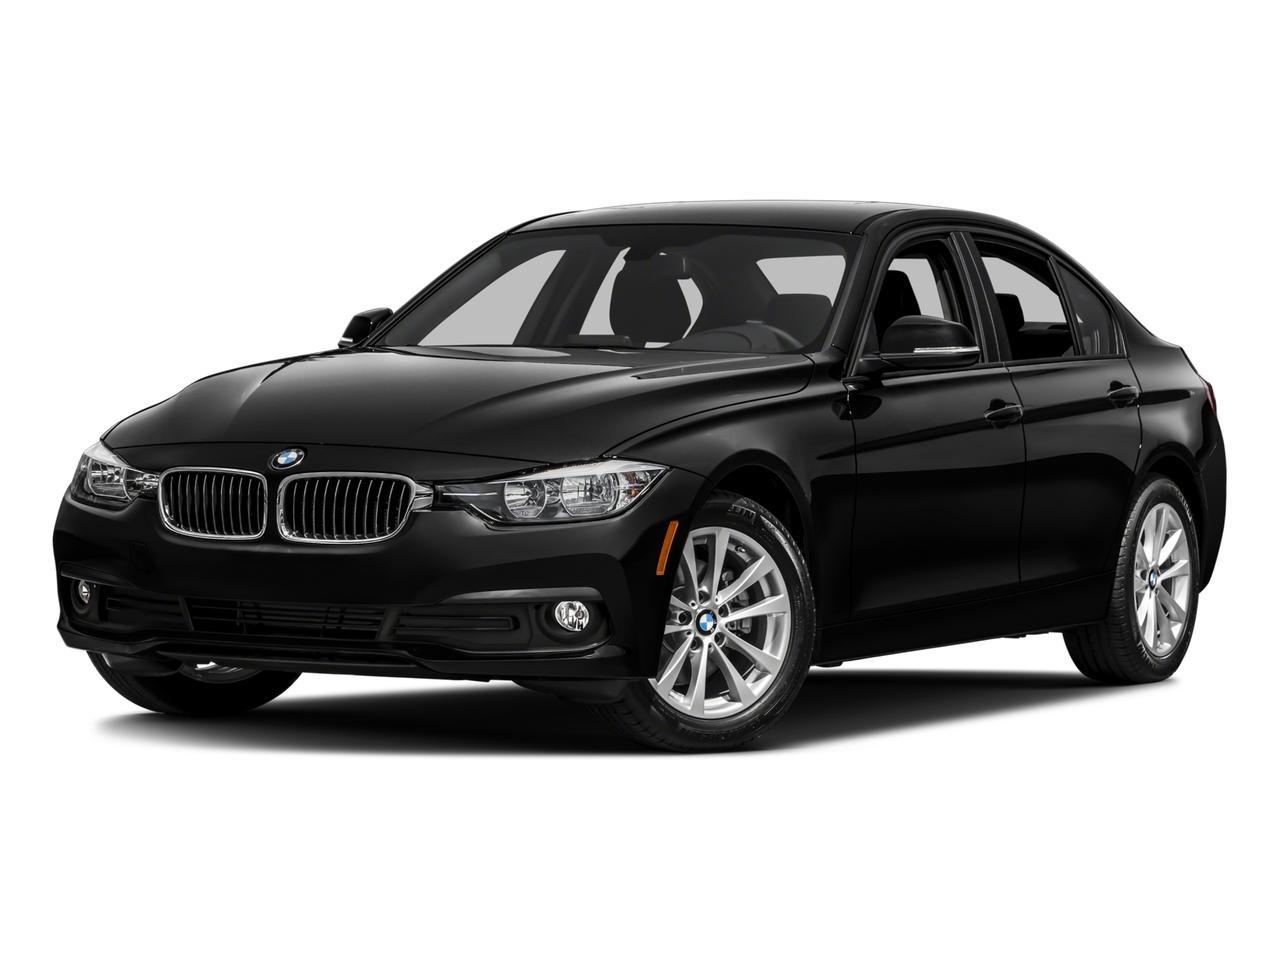 2016 BMW 320i Vehicle Photo in San Antonio, TX 78230